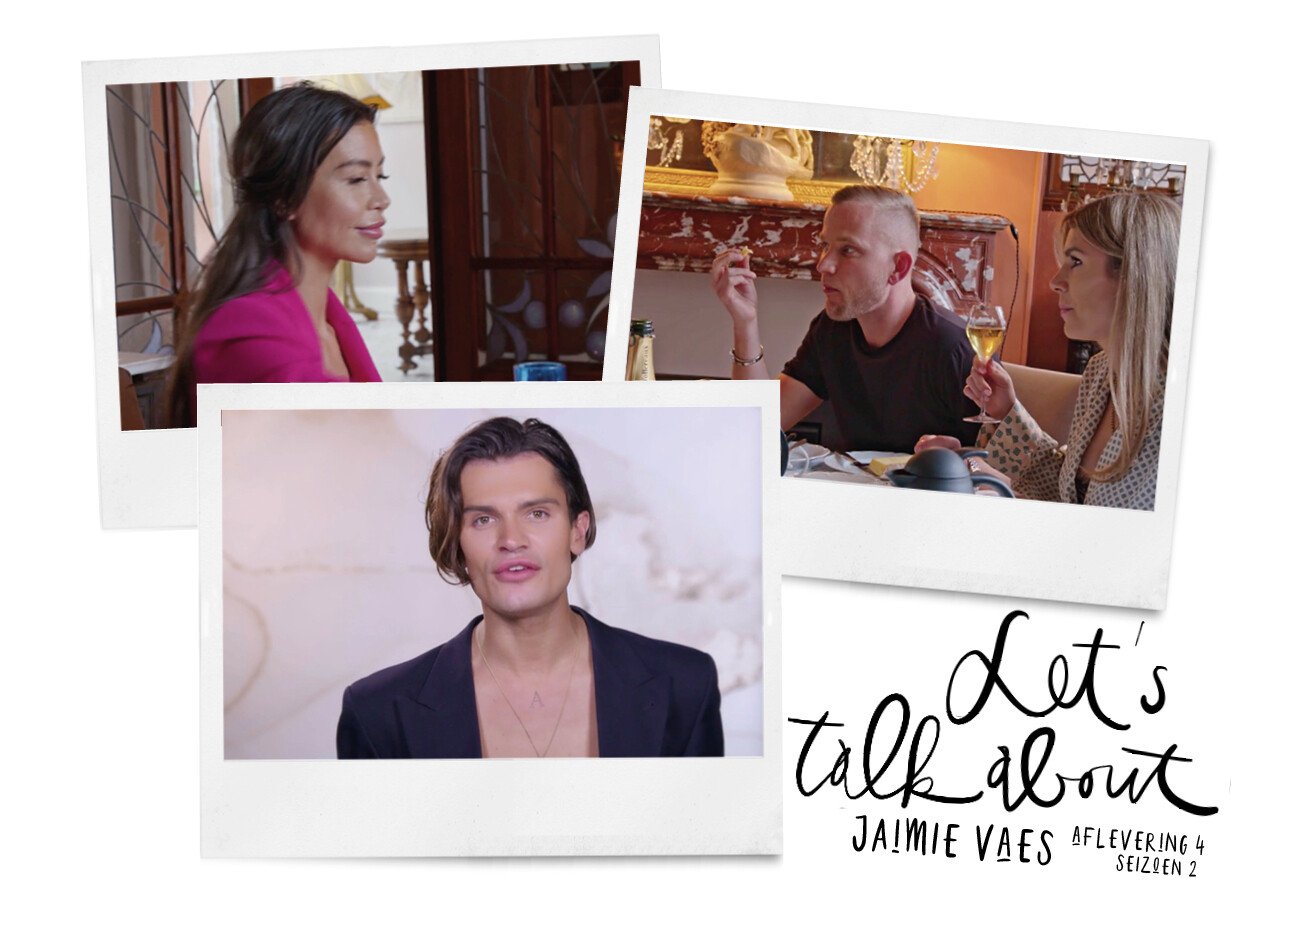 Jamie Vaes in the Vaes Lane Life